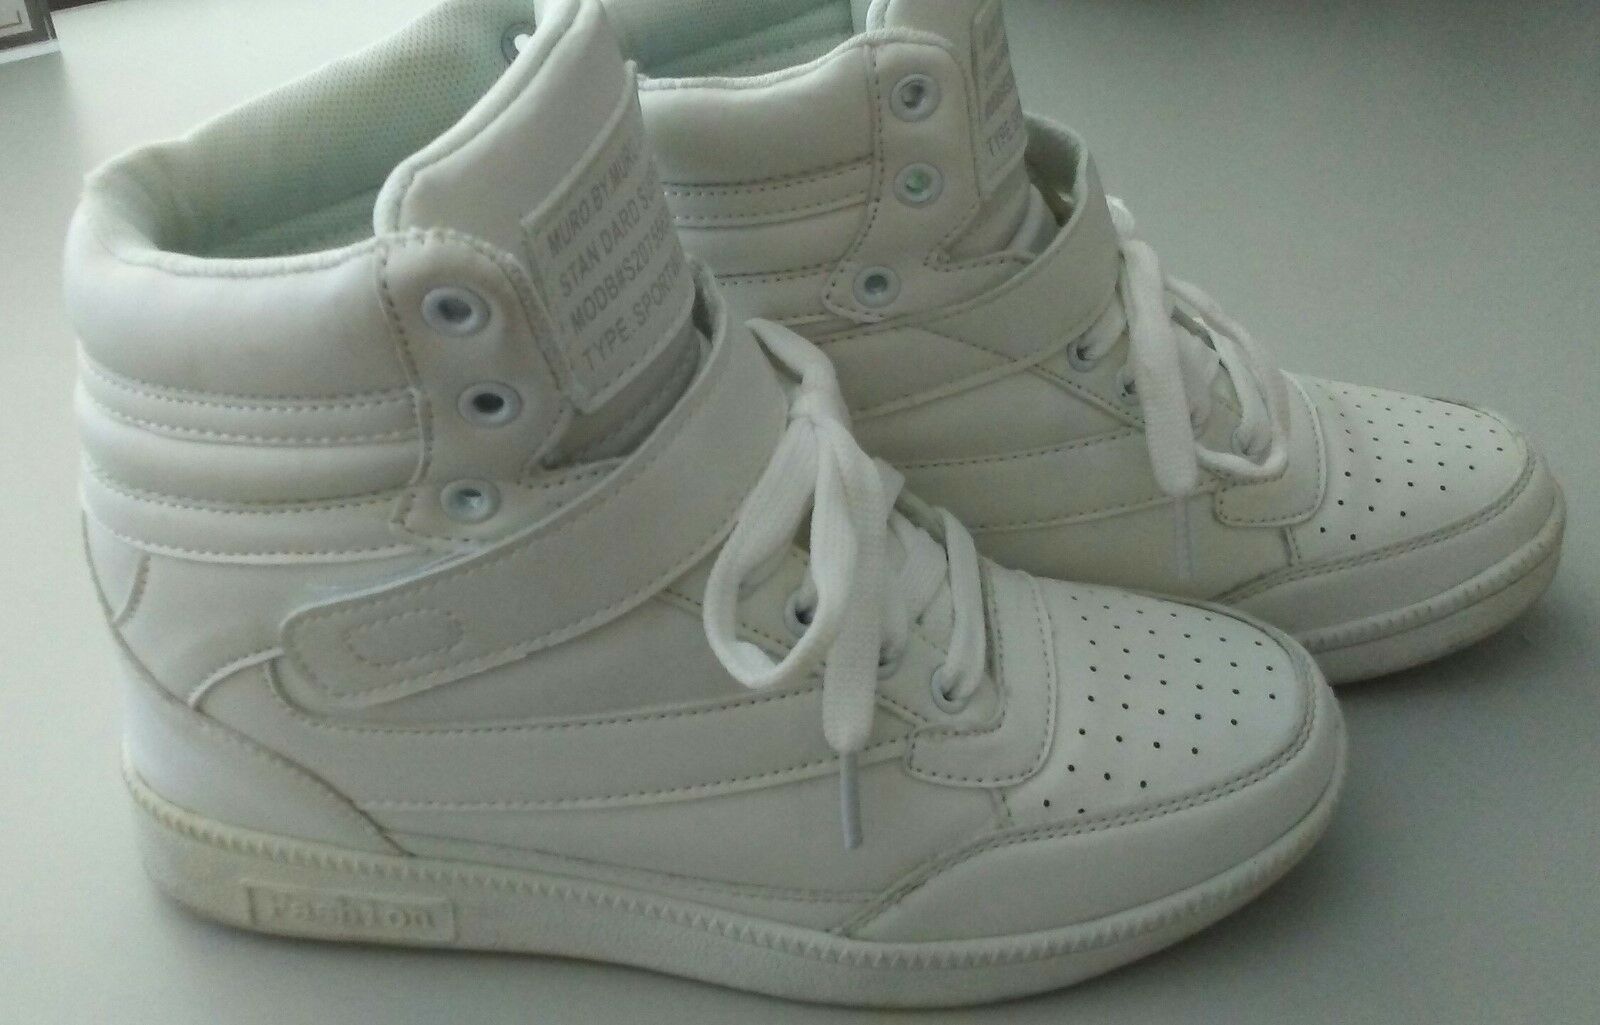 MURO.BY.MURO FashionWhite Hidden Wedge High Top Sneakers Velcro/Lace Closure